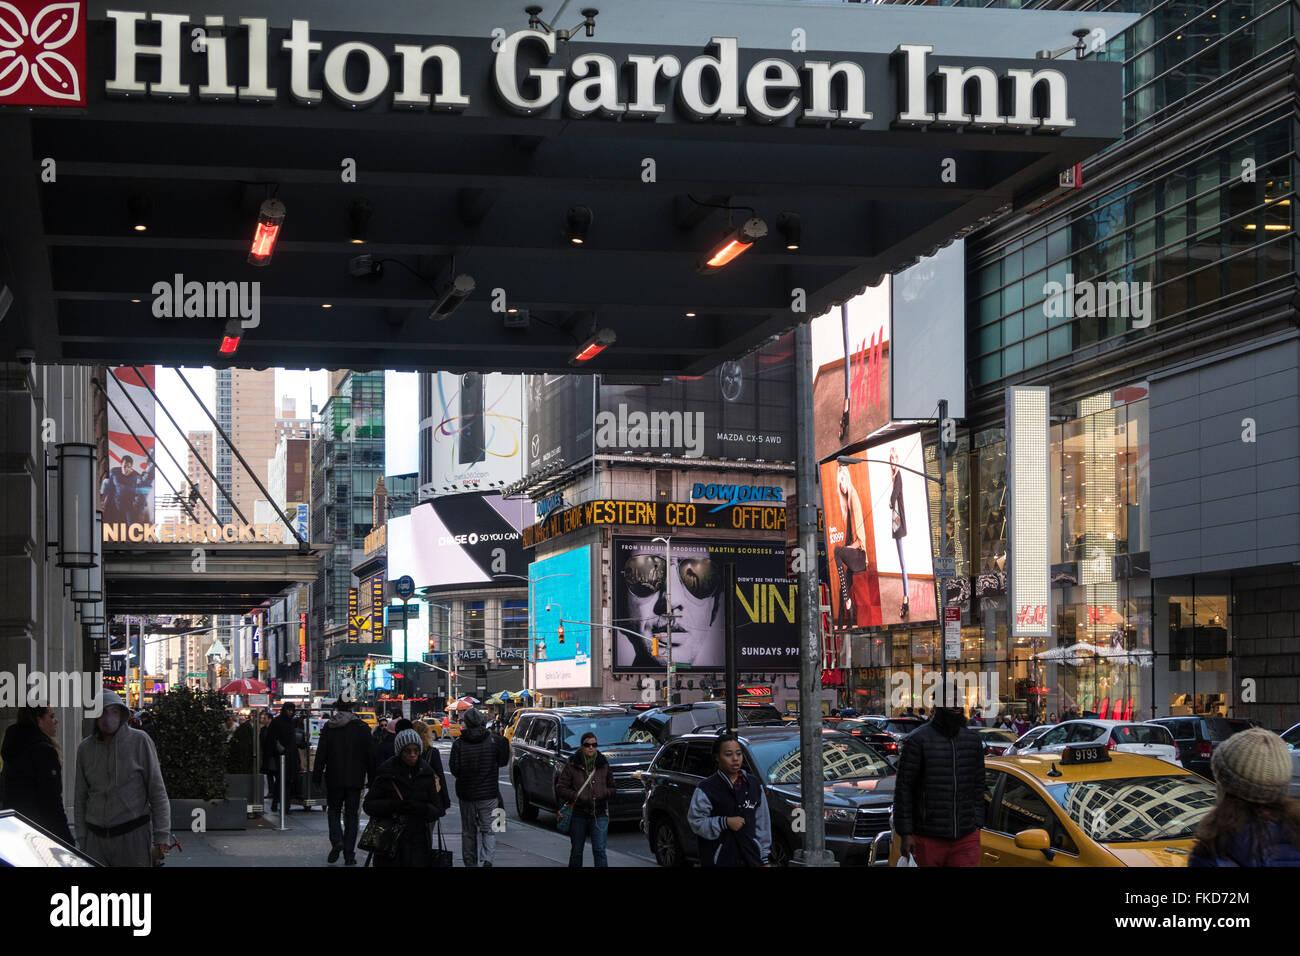 hilton garden inn front entrance sign 42nd street times square - Hilton Garden Inn Time Square